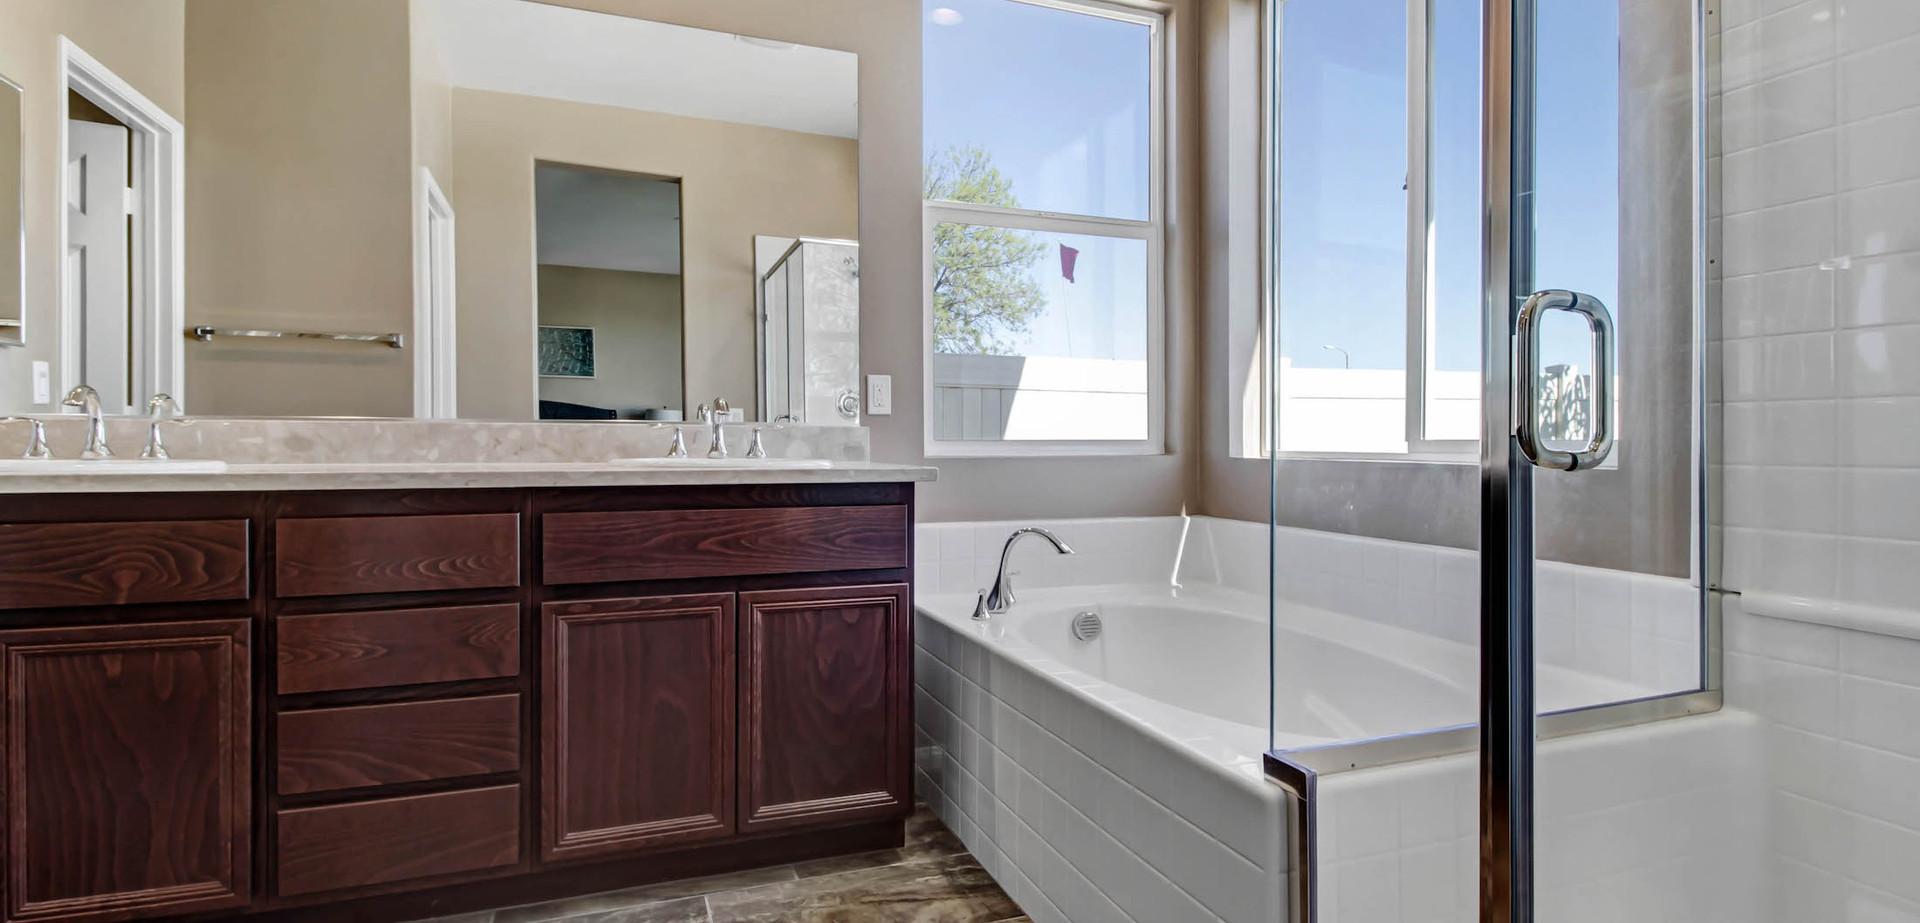 model-2 bathtub 2200x1500.jpg